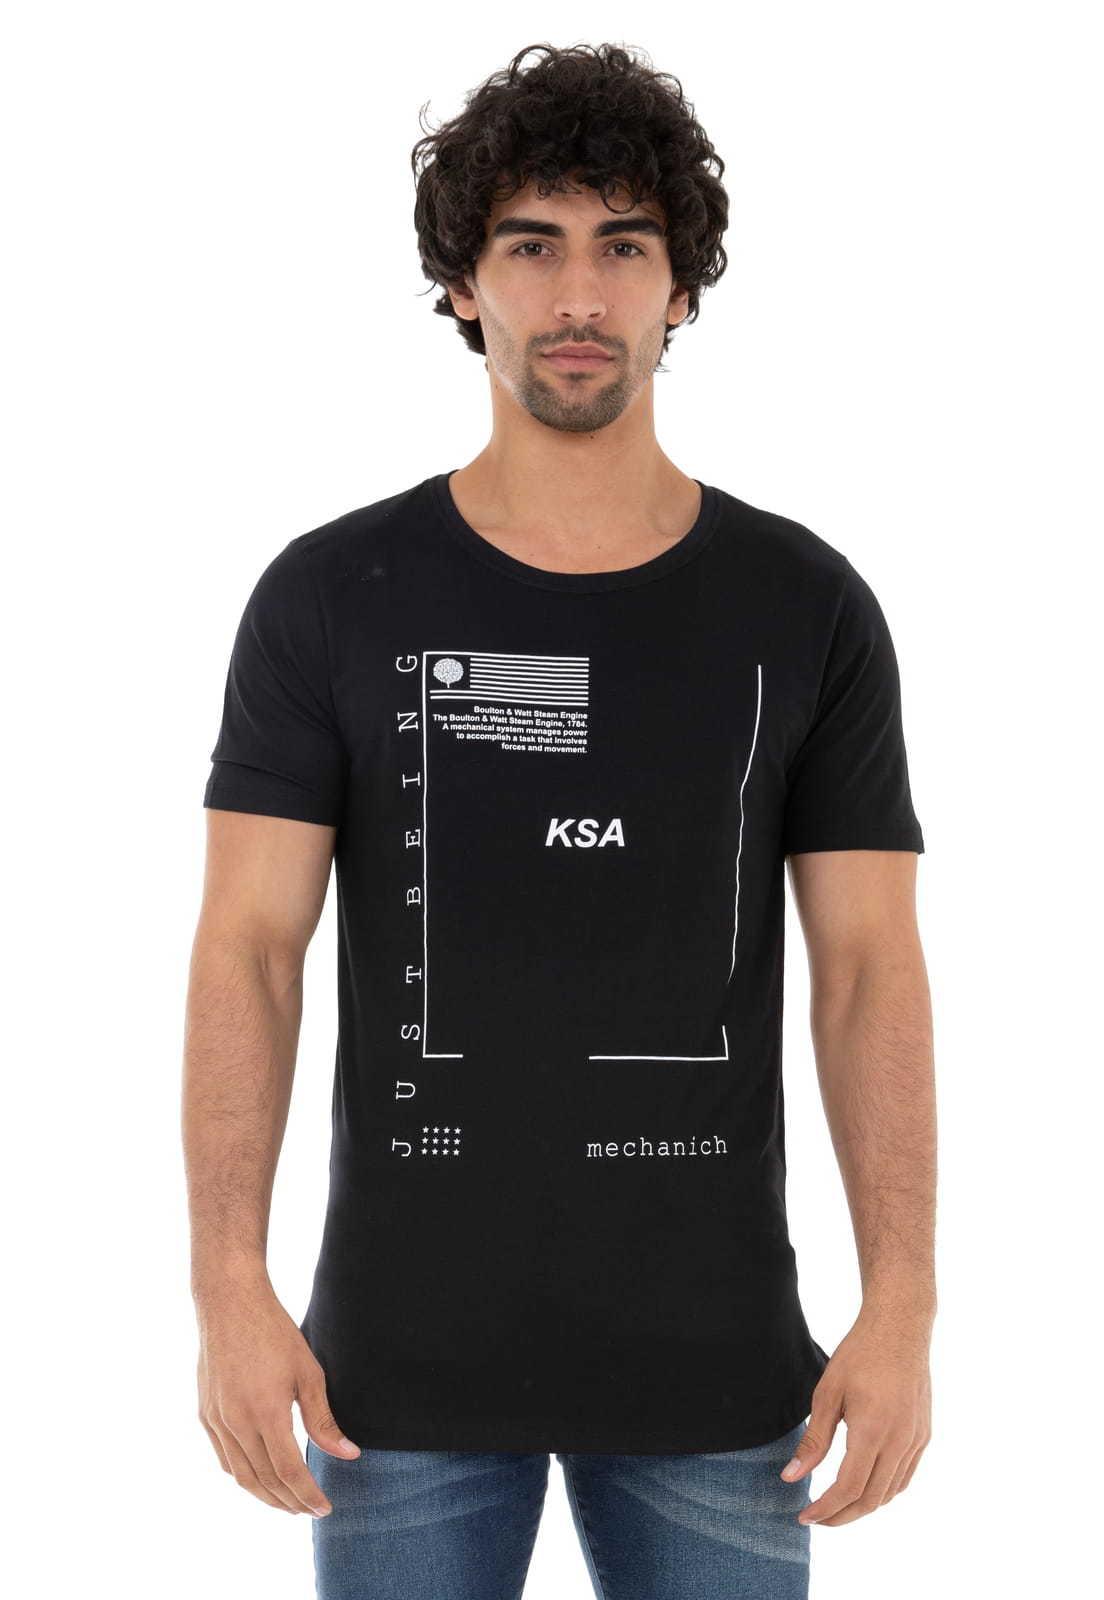 Camiseta Longline Just Being KSA da árvore